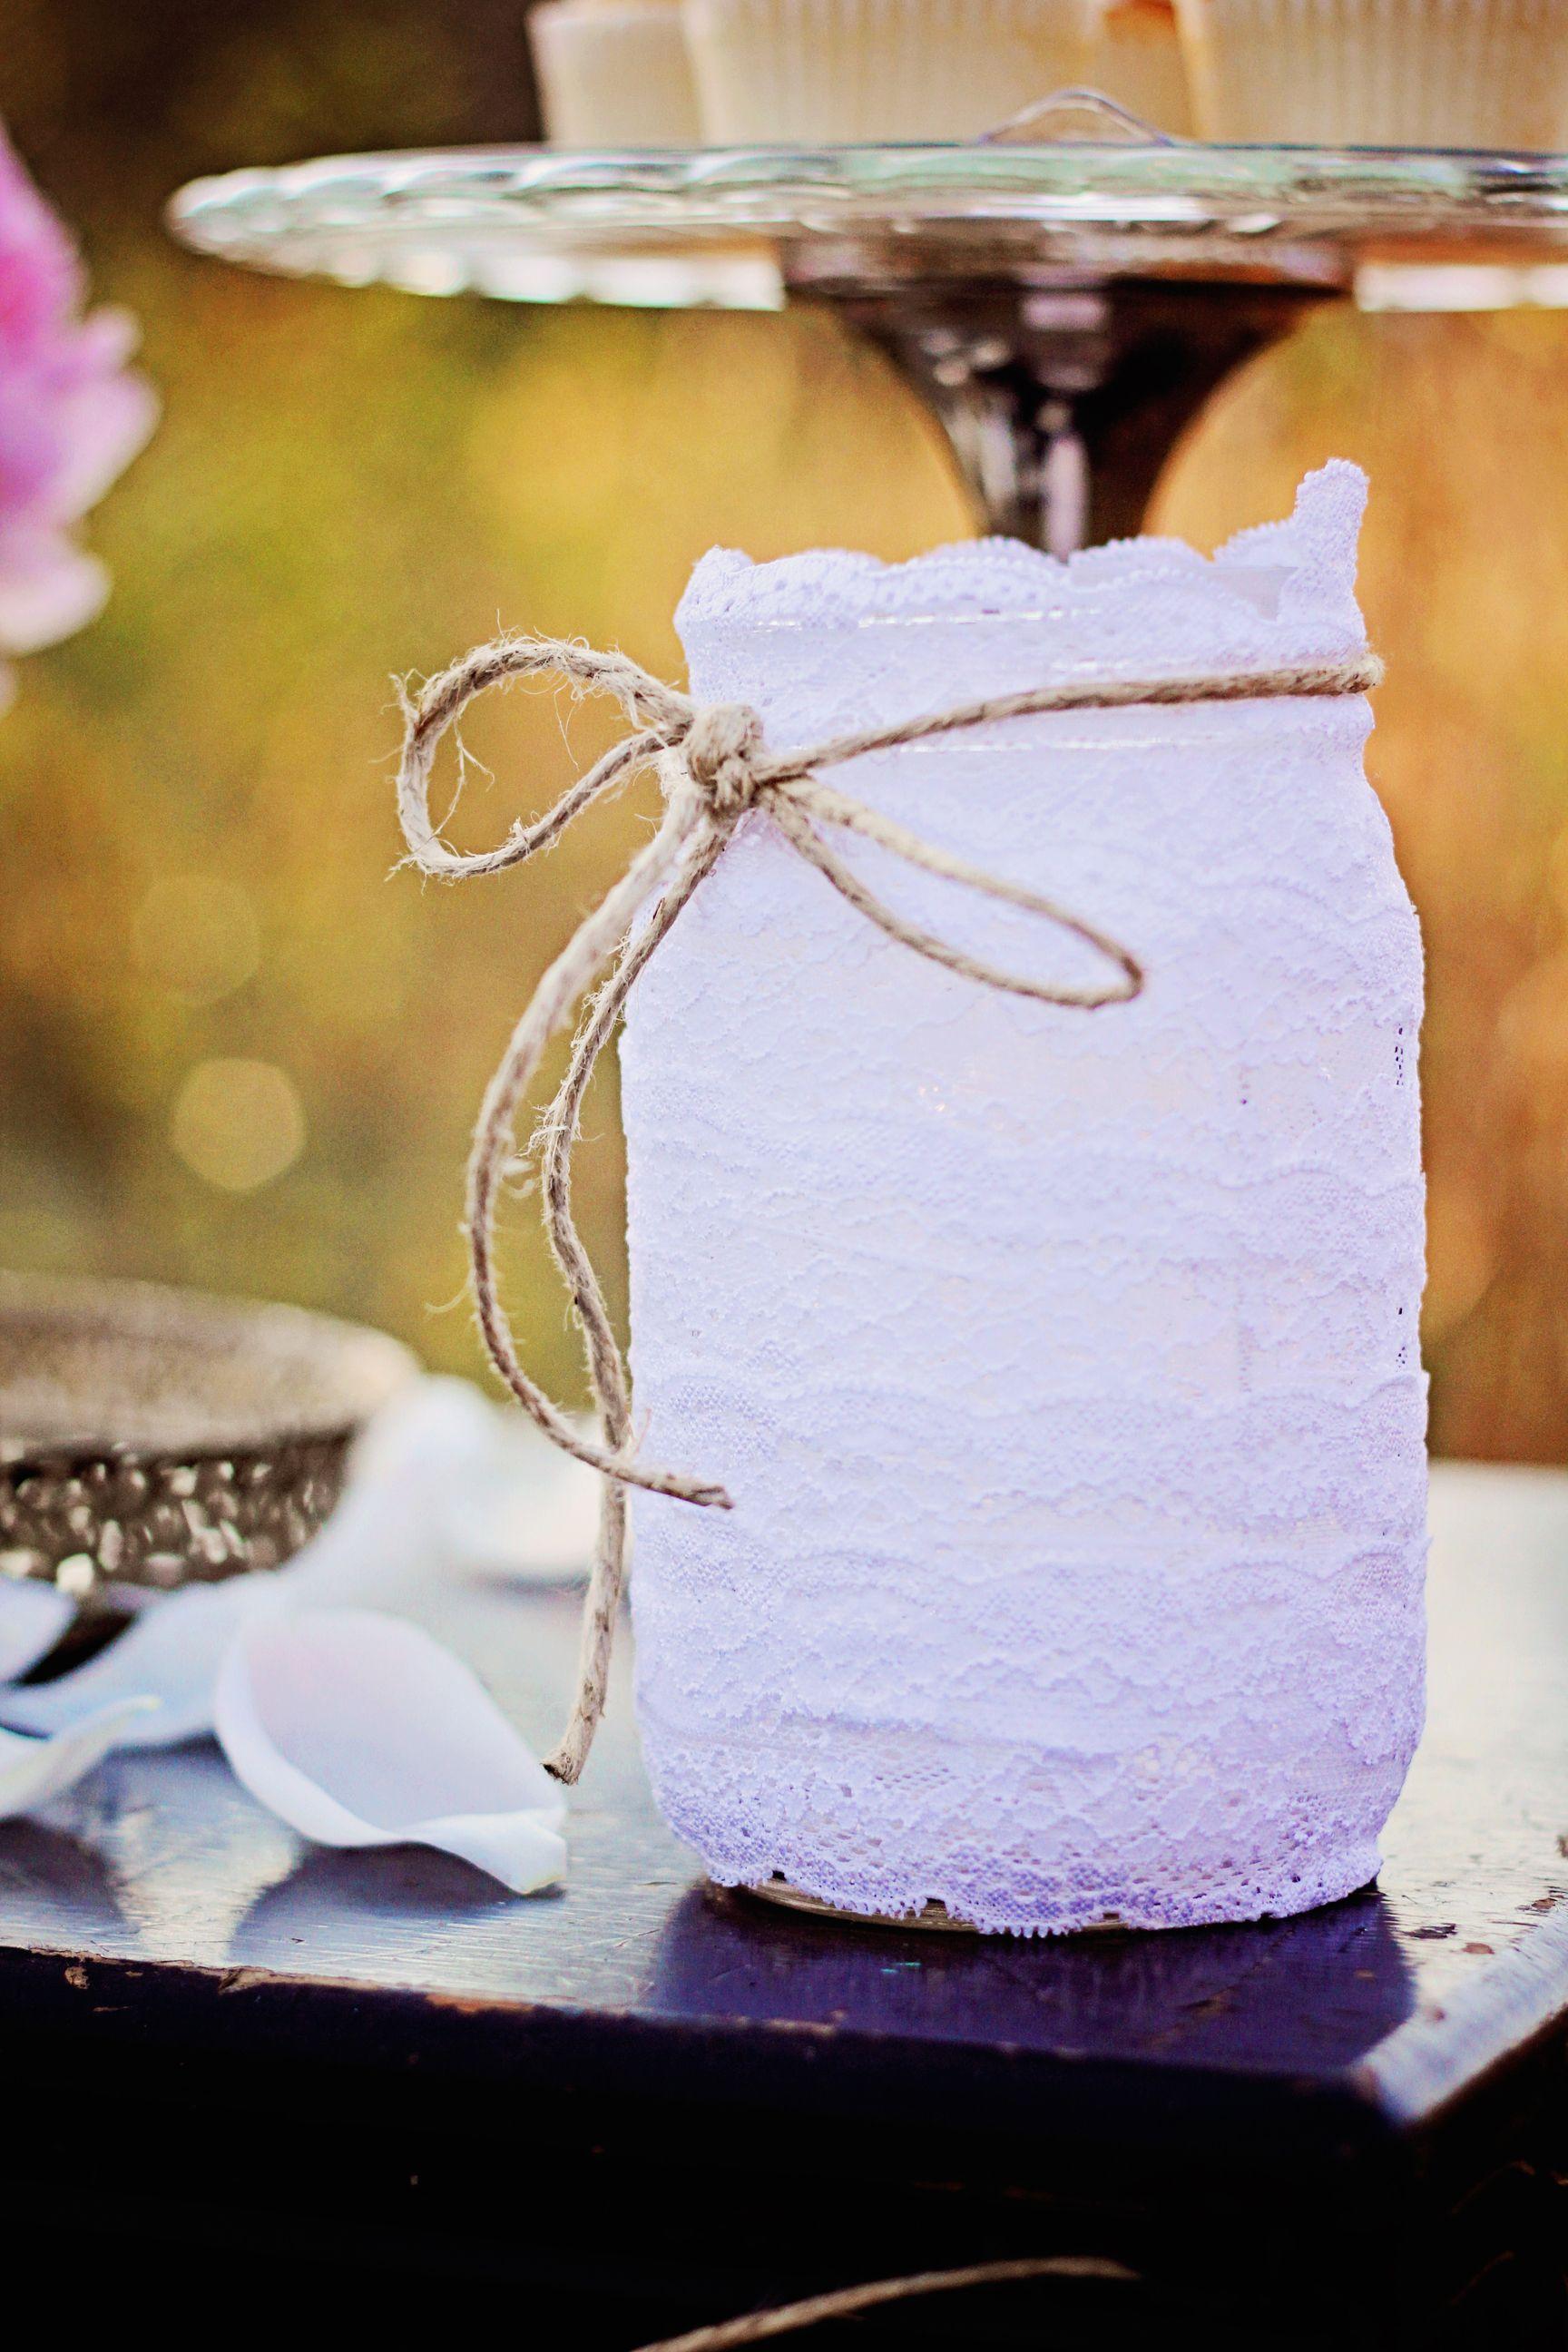 Vintage style wedding decoration ideas  Inspiration And Ideas For A Vintage Style Wedding  Pinterest  Jar